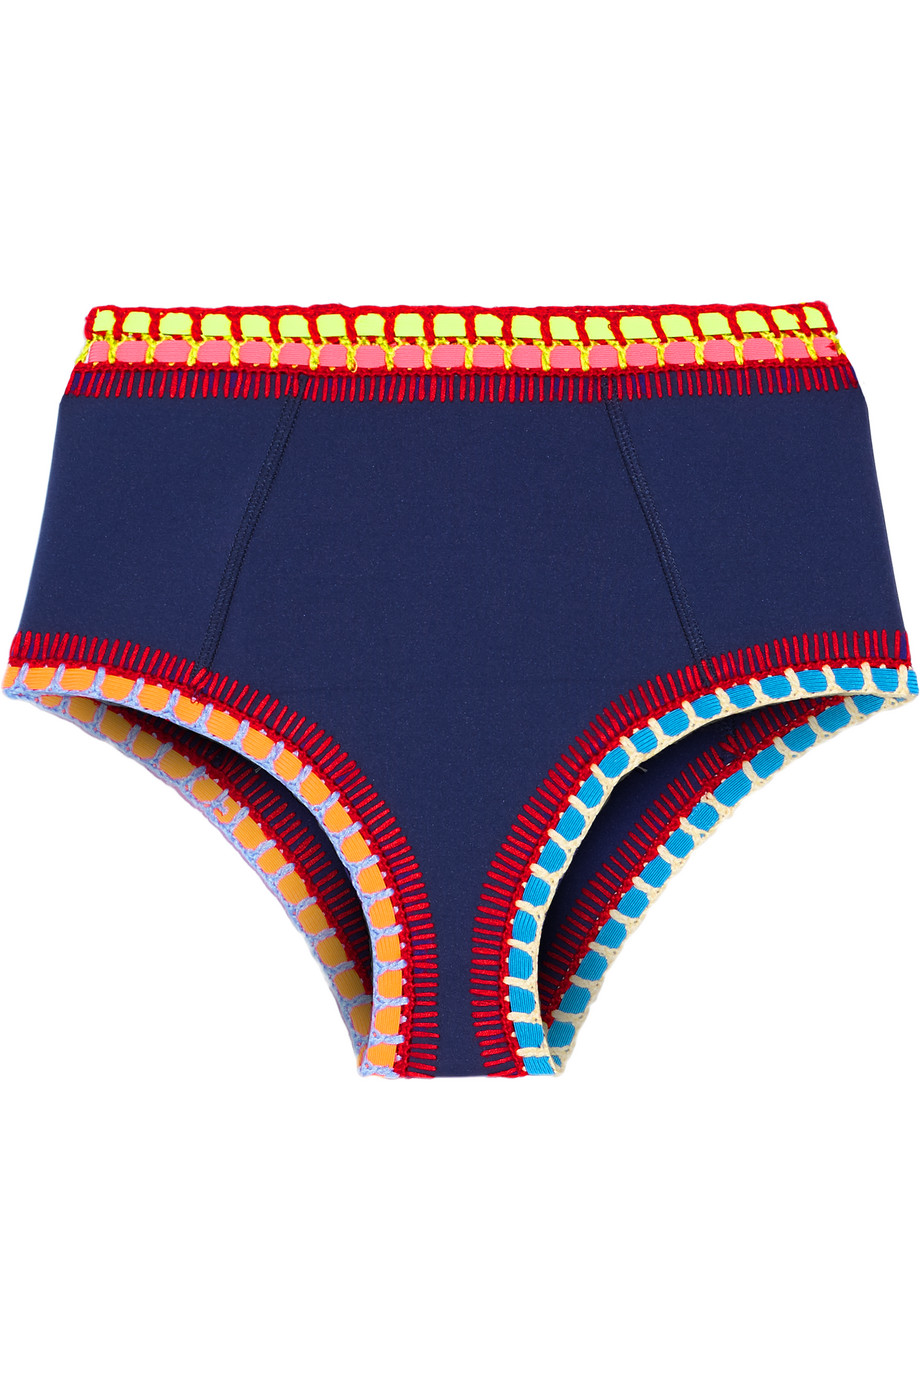 Tasmin Crochet-Trimmed Bikini Briefs, Navy, Women's, Size: S